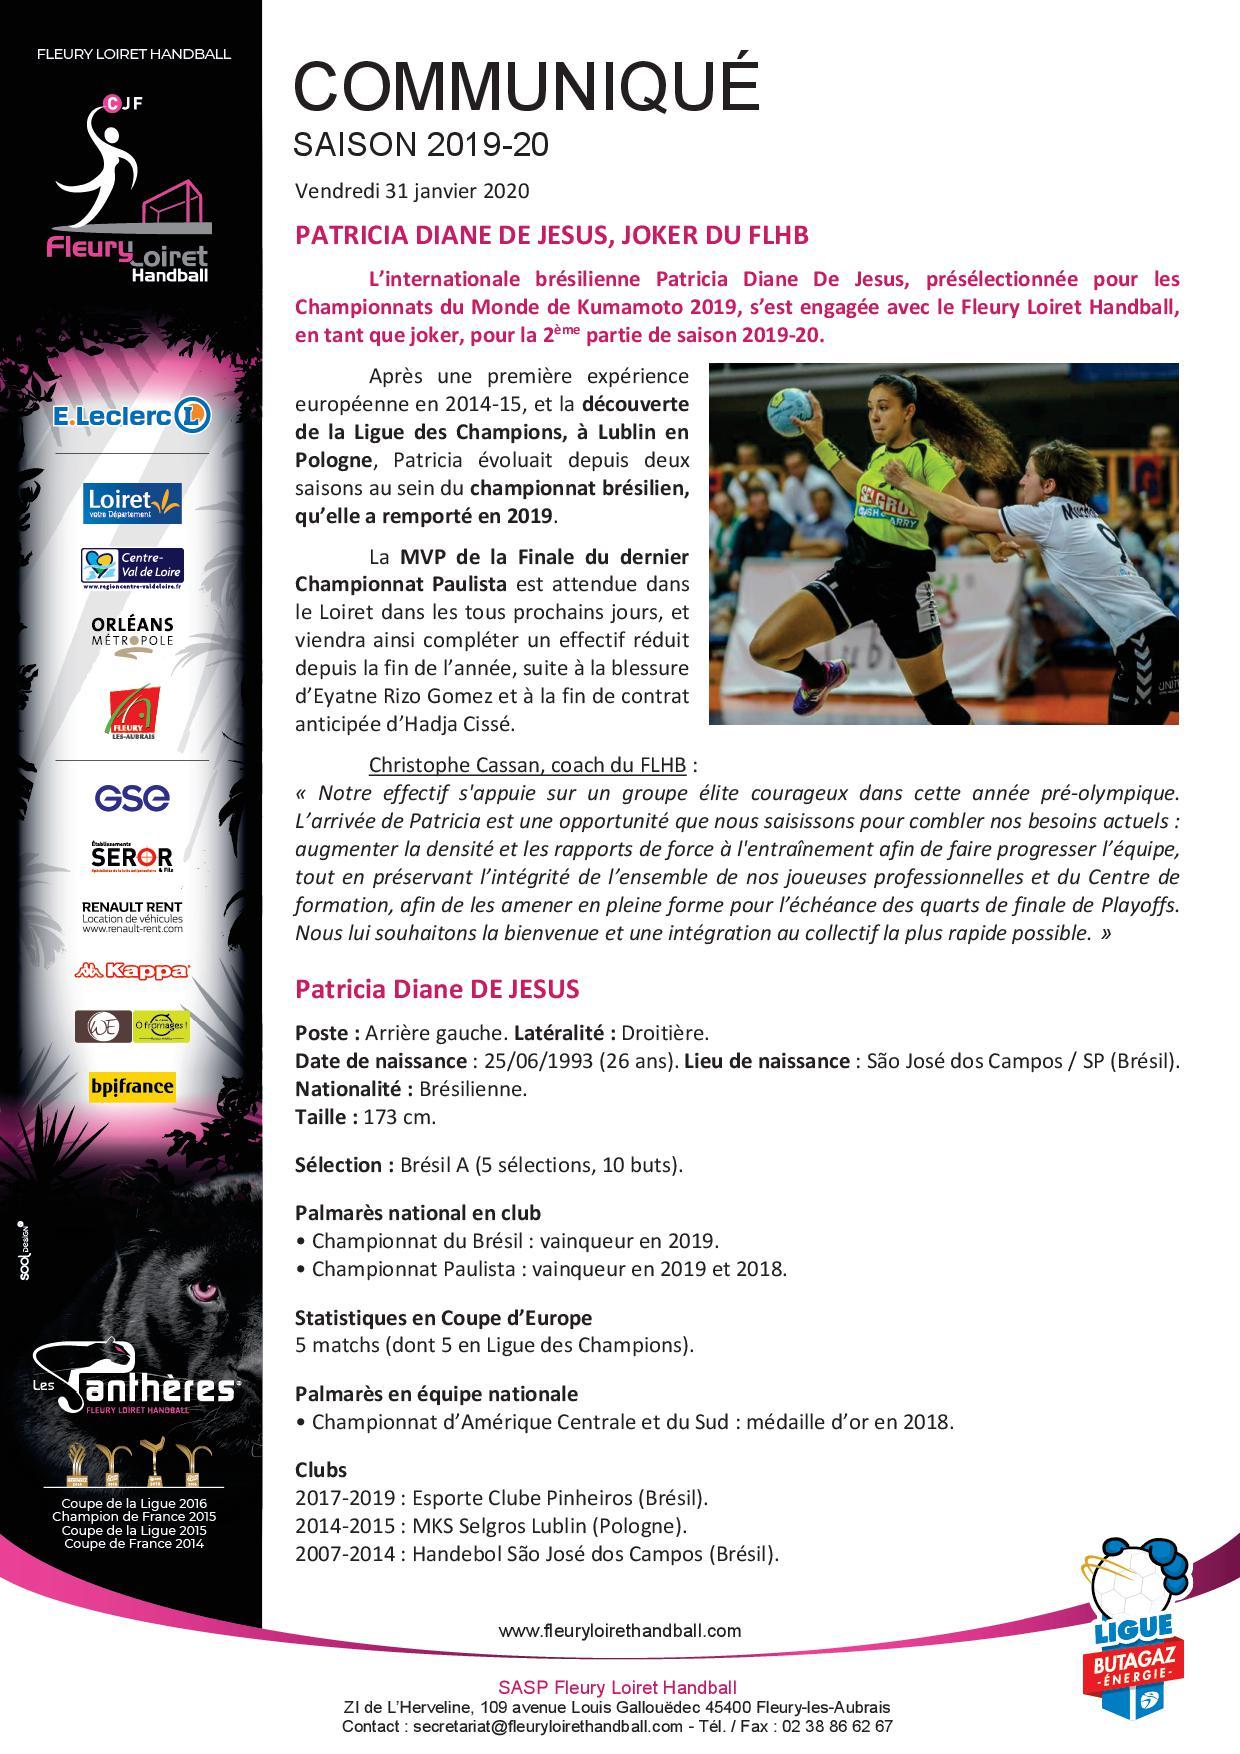 Communiqué Fleury Loiret Handball - Vendredi 31 janvier 2020.jpg